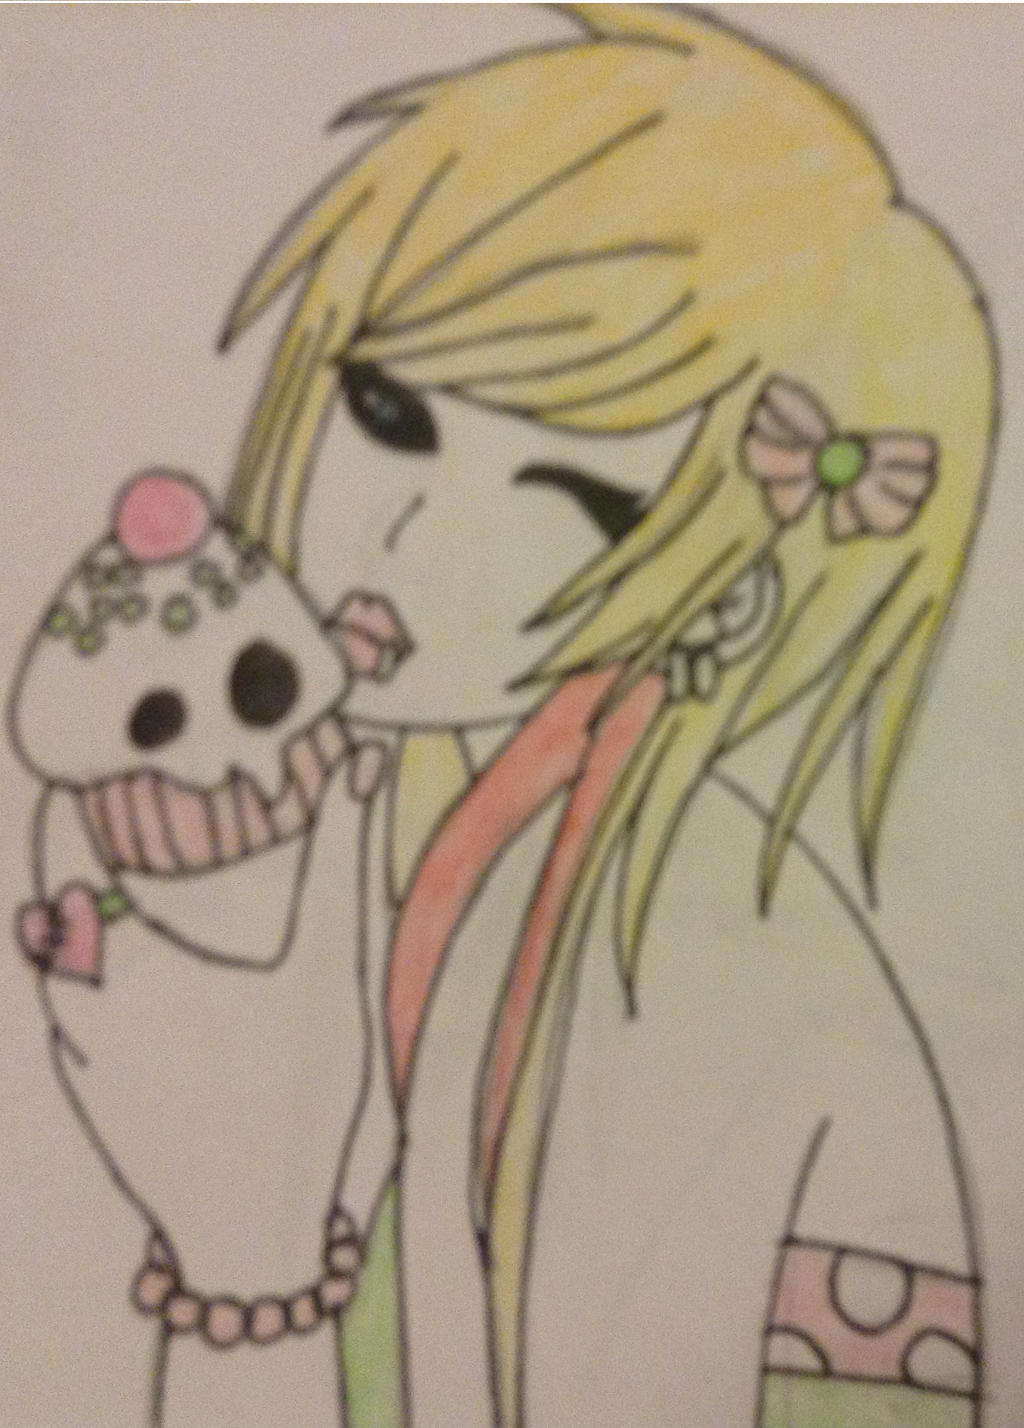 Emo Cutie by WhiteBleedingFox